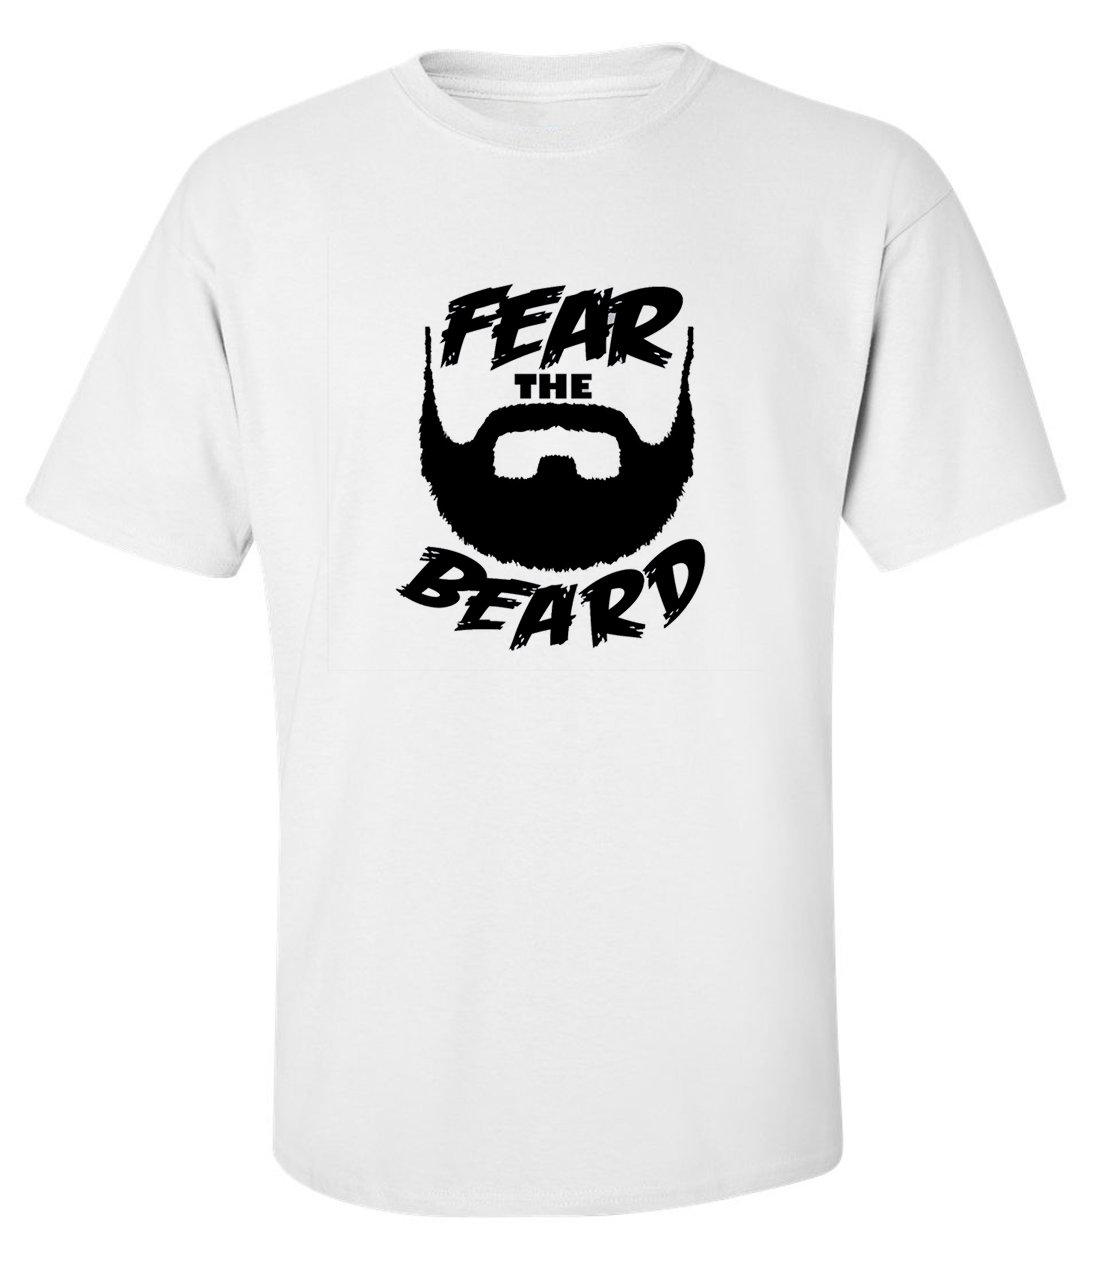 Fear the beard funny slogan men printed cotton white t-shirt size XL